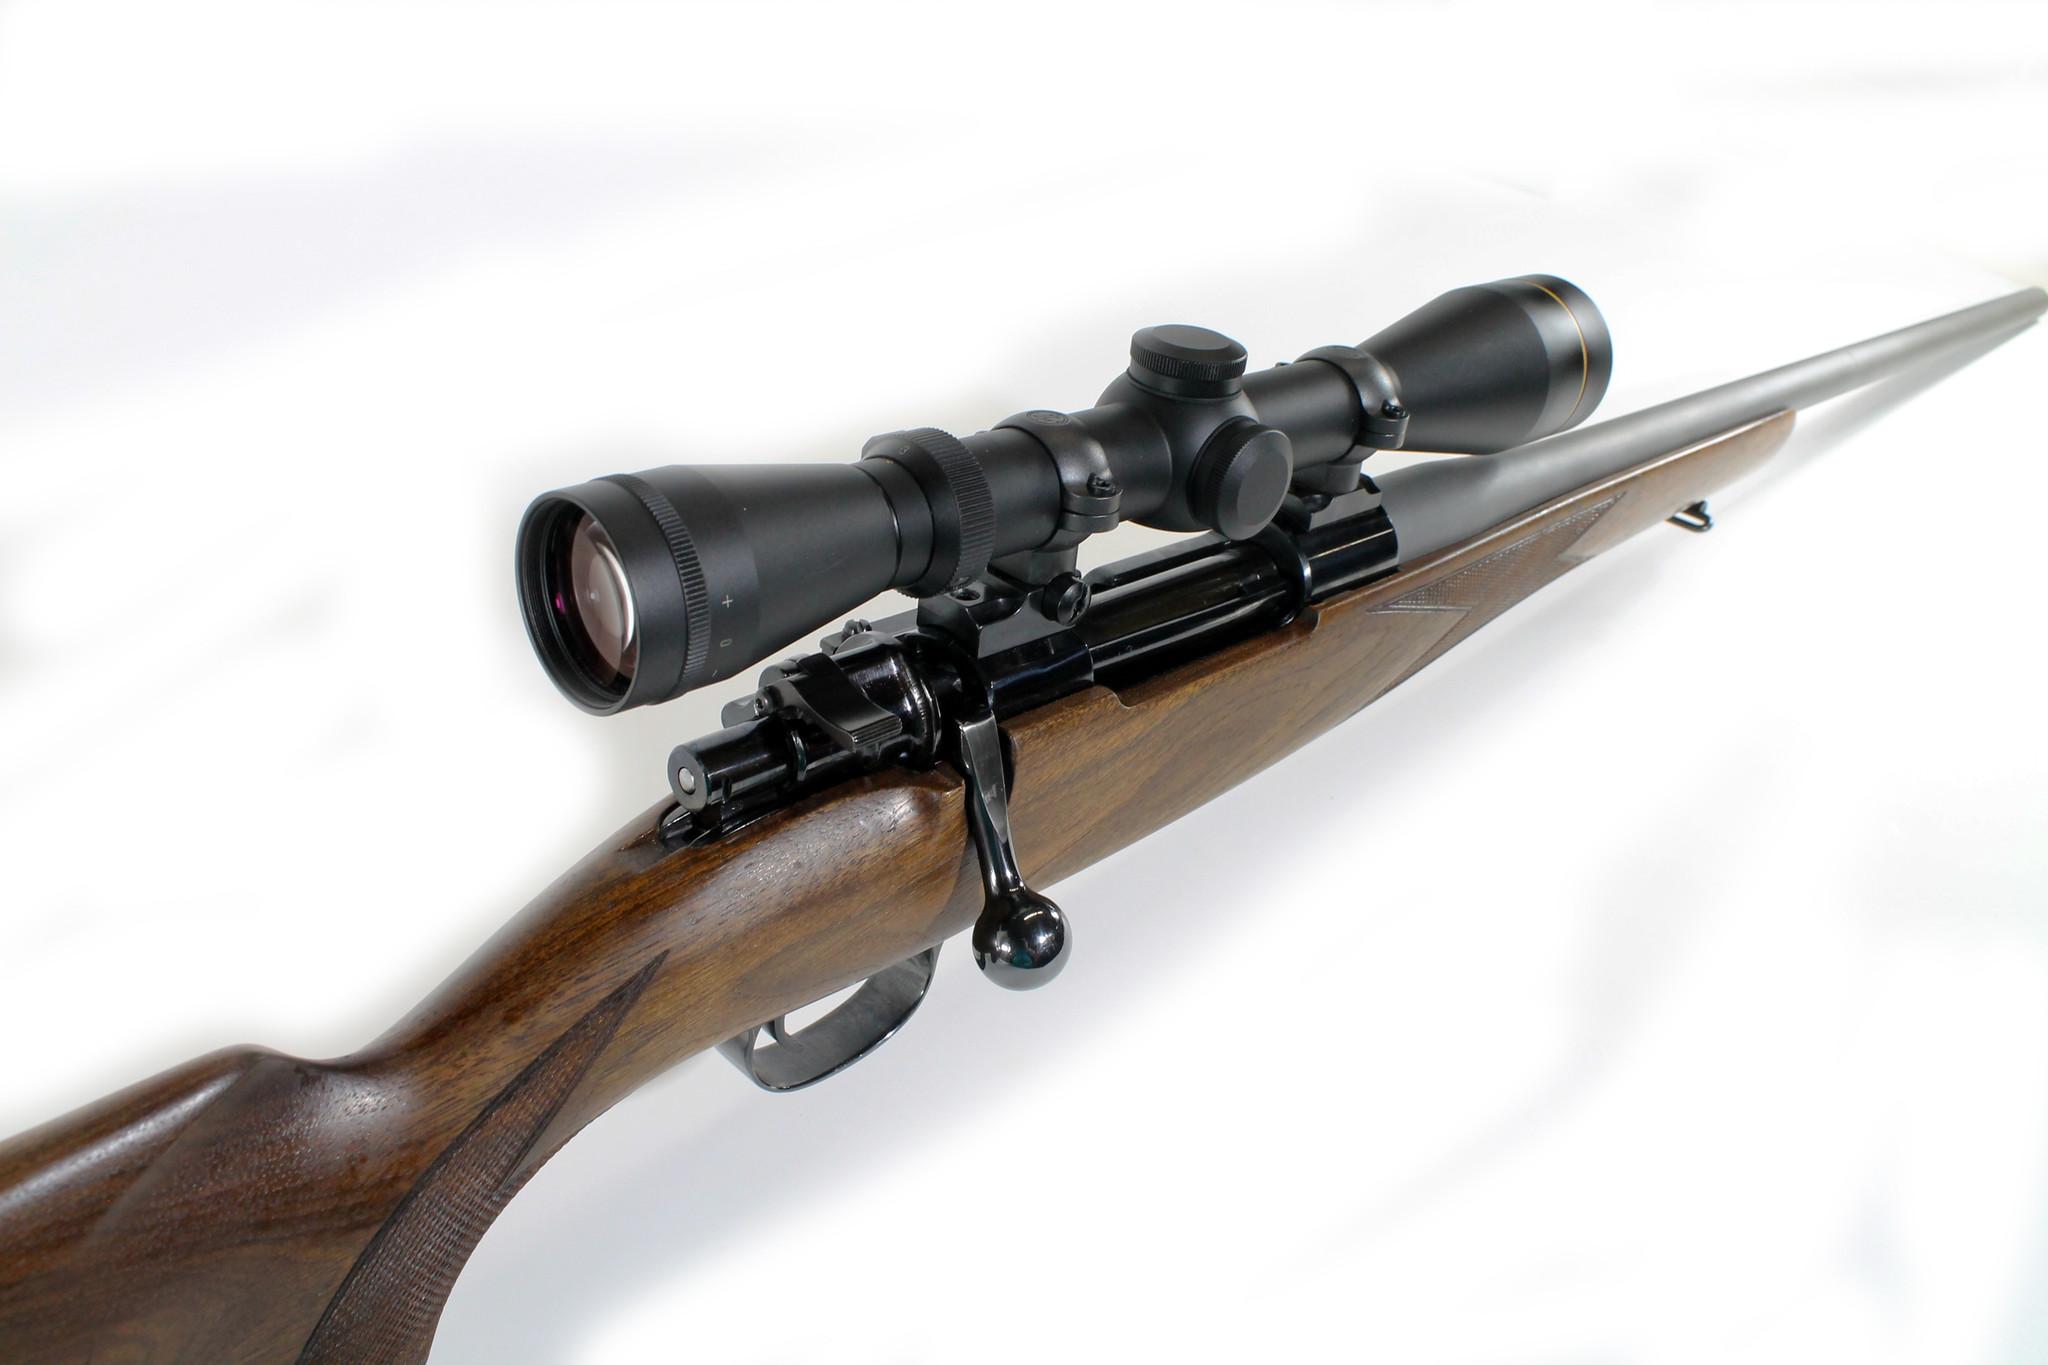 Mauser CG-0033 USED Mauser 98 Custom Rifle .30-06 Springfield w/ McLenan Barrel and Leupold VX-2 3-9x Scope